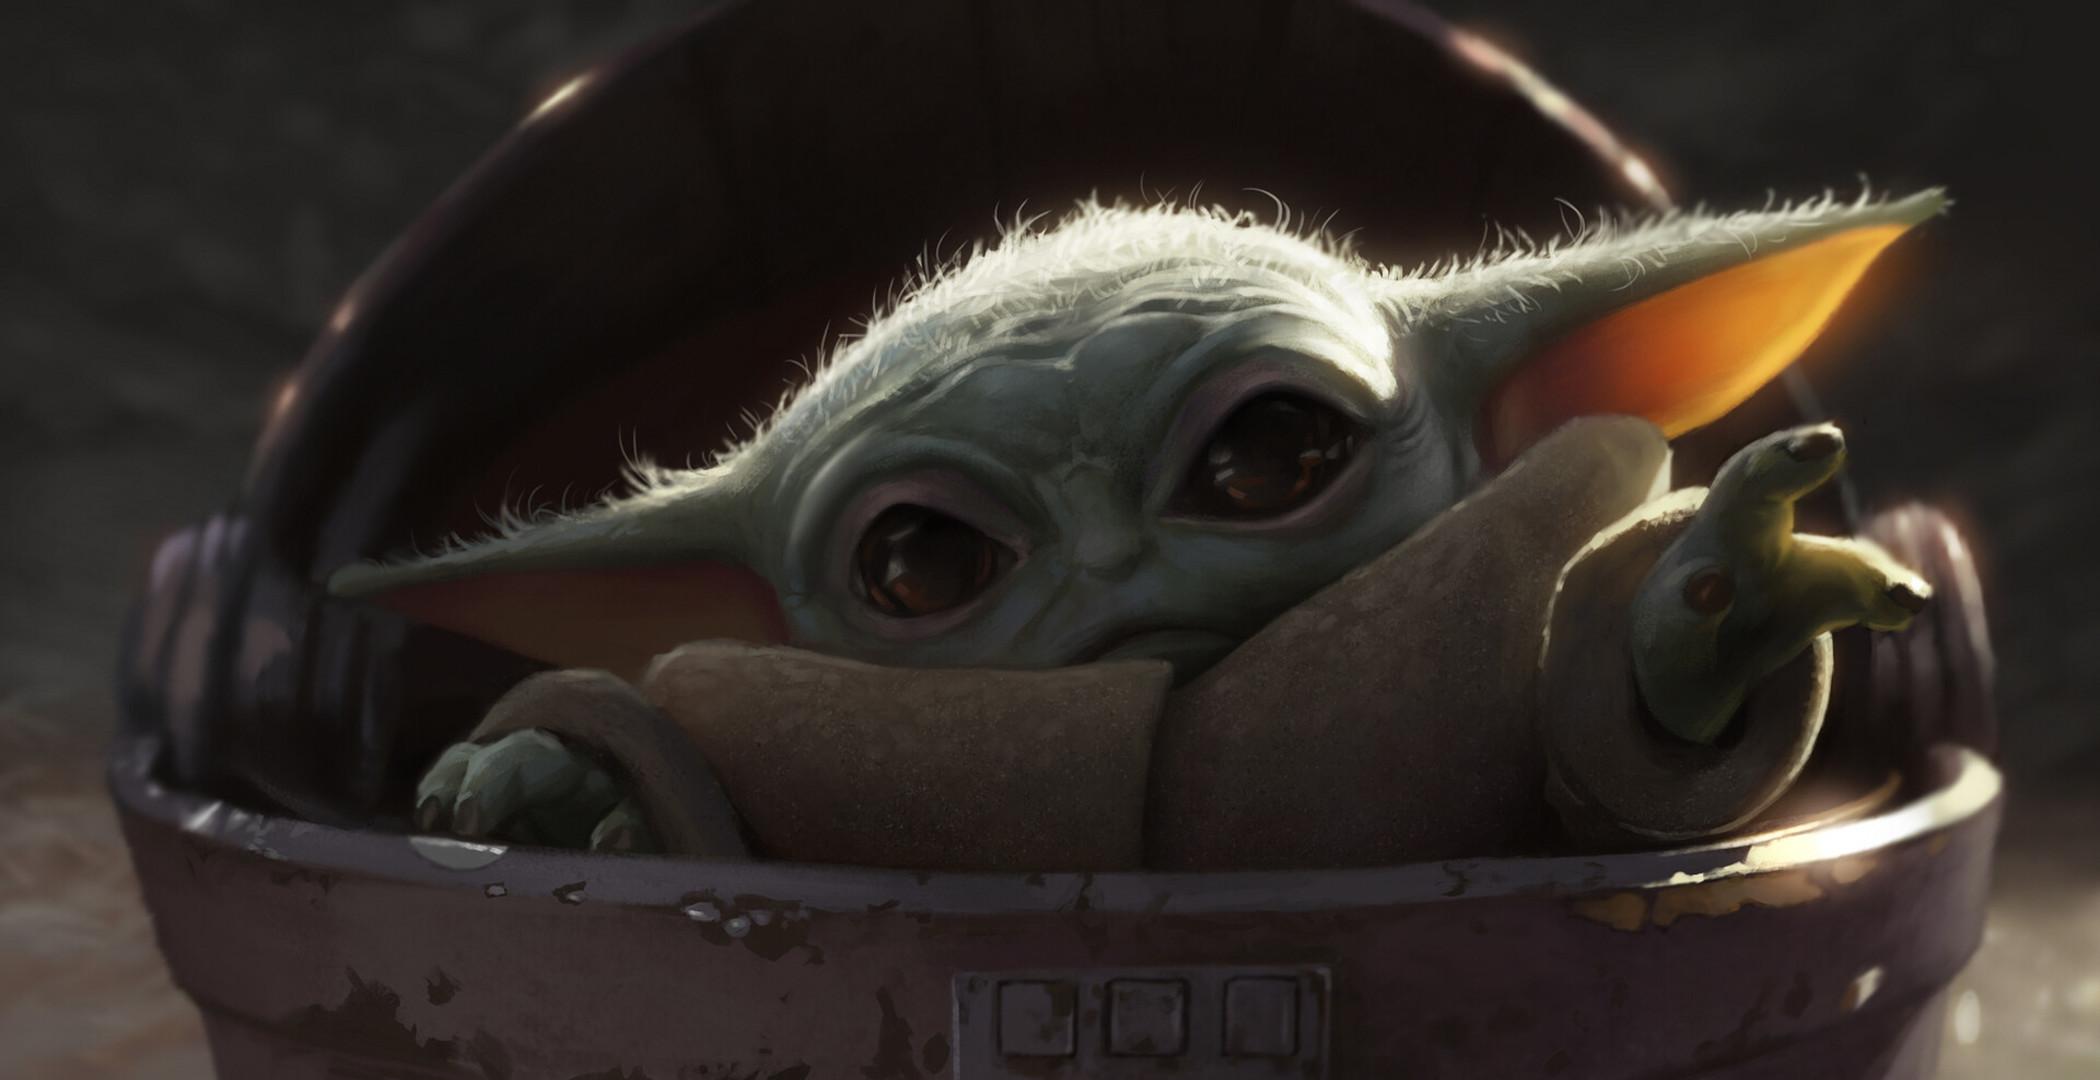 General 2100x1080 The Mandalorian Star Wars Baby Yoda Grogu digital art